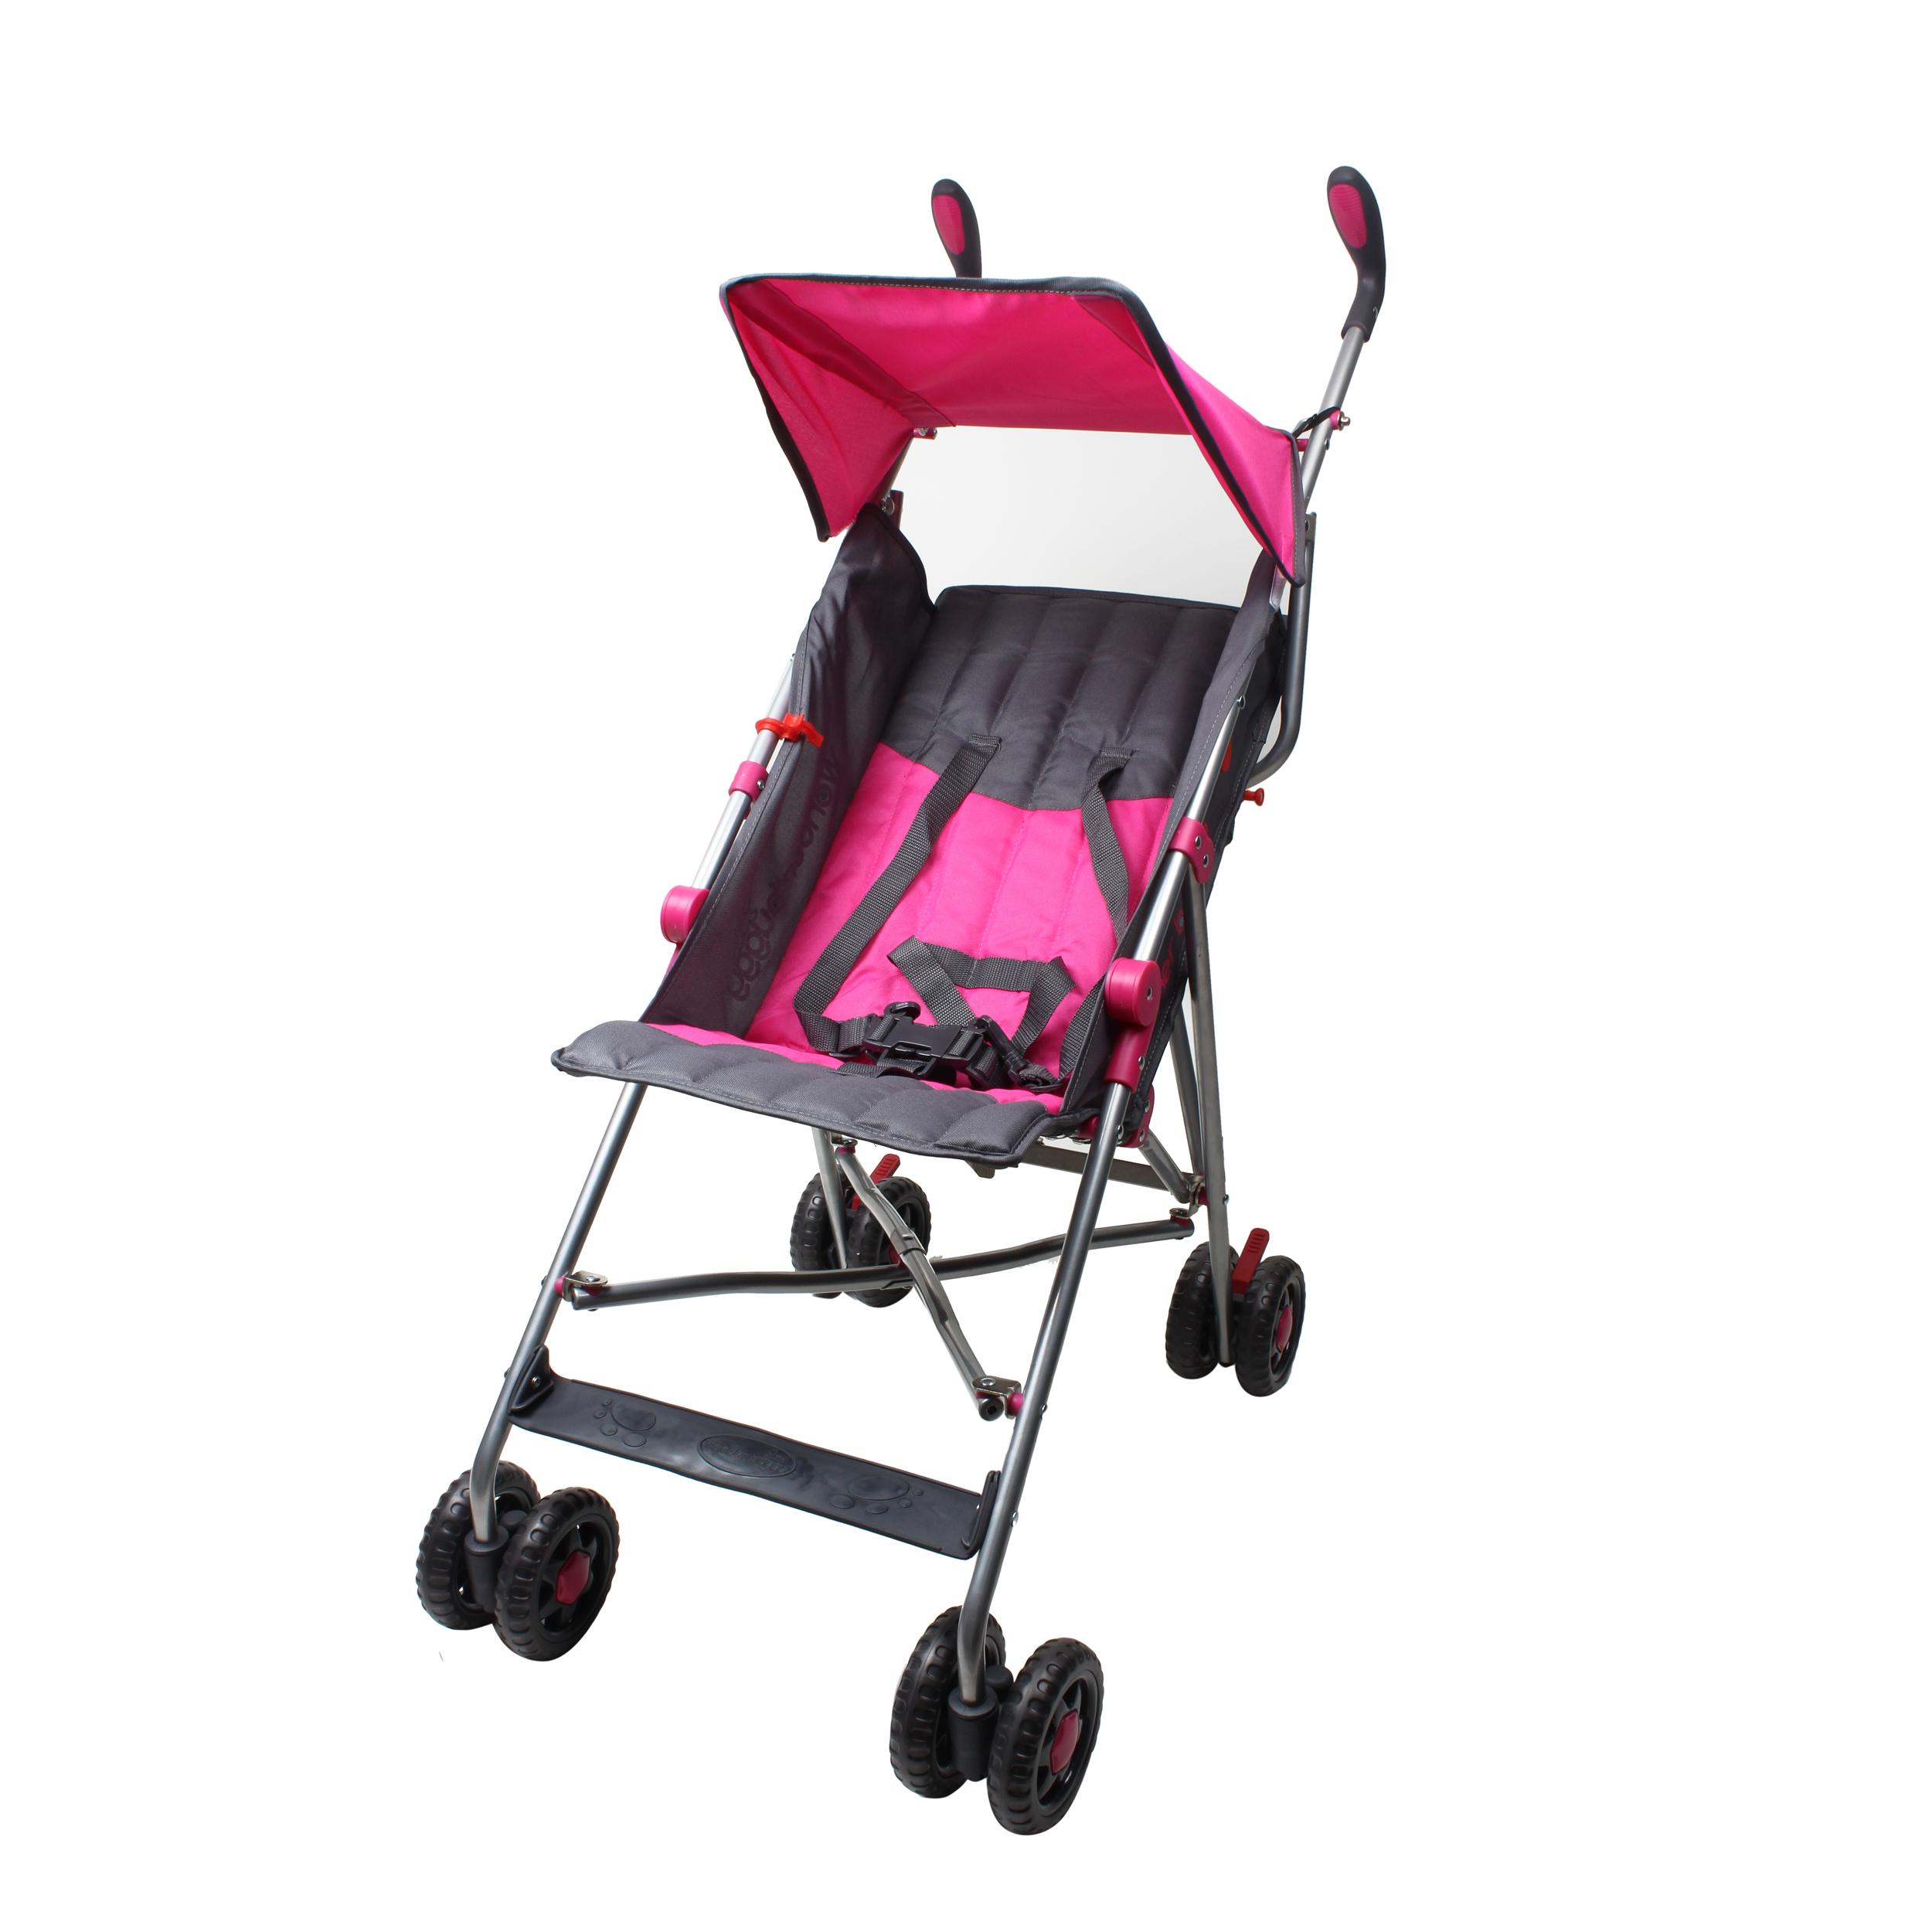 Wonder Buggy Taylor Umbrella Stroller With Flat Canopy - Solid Burgundy